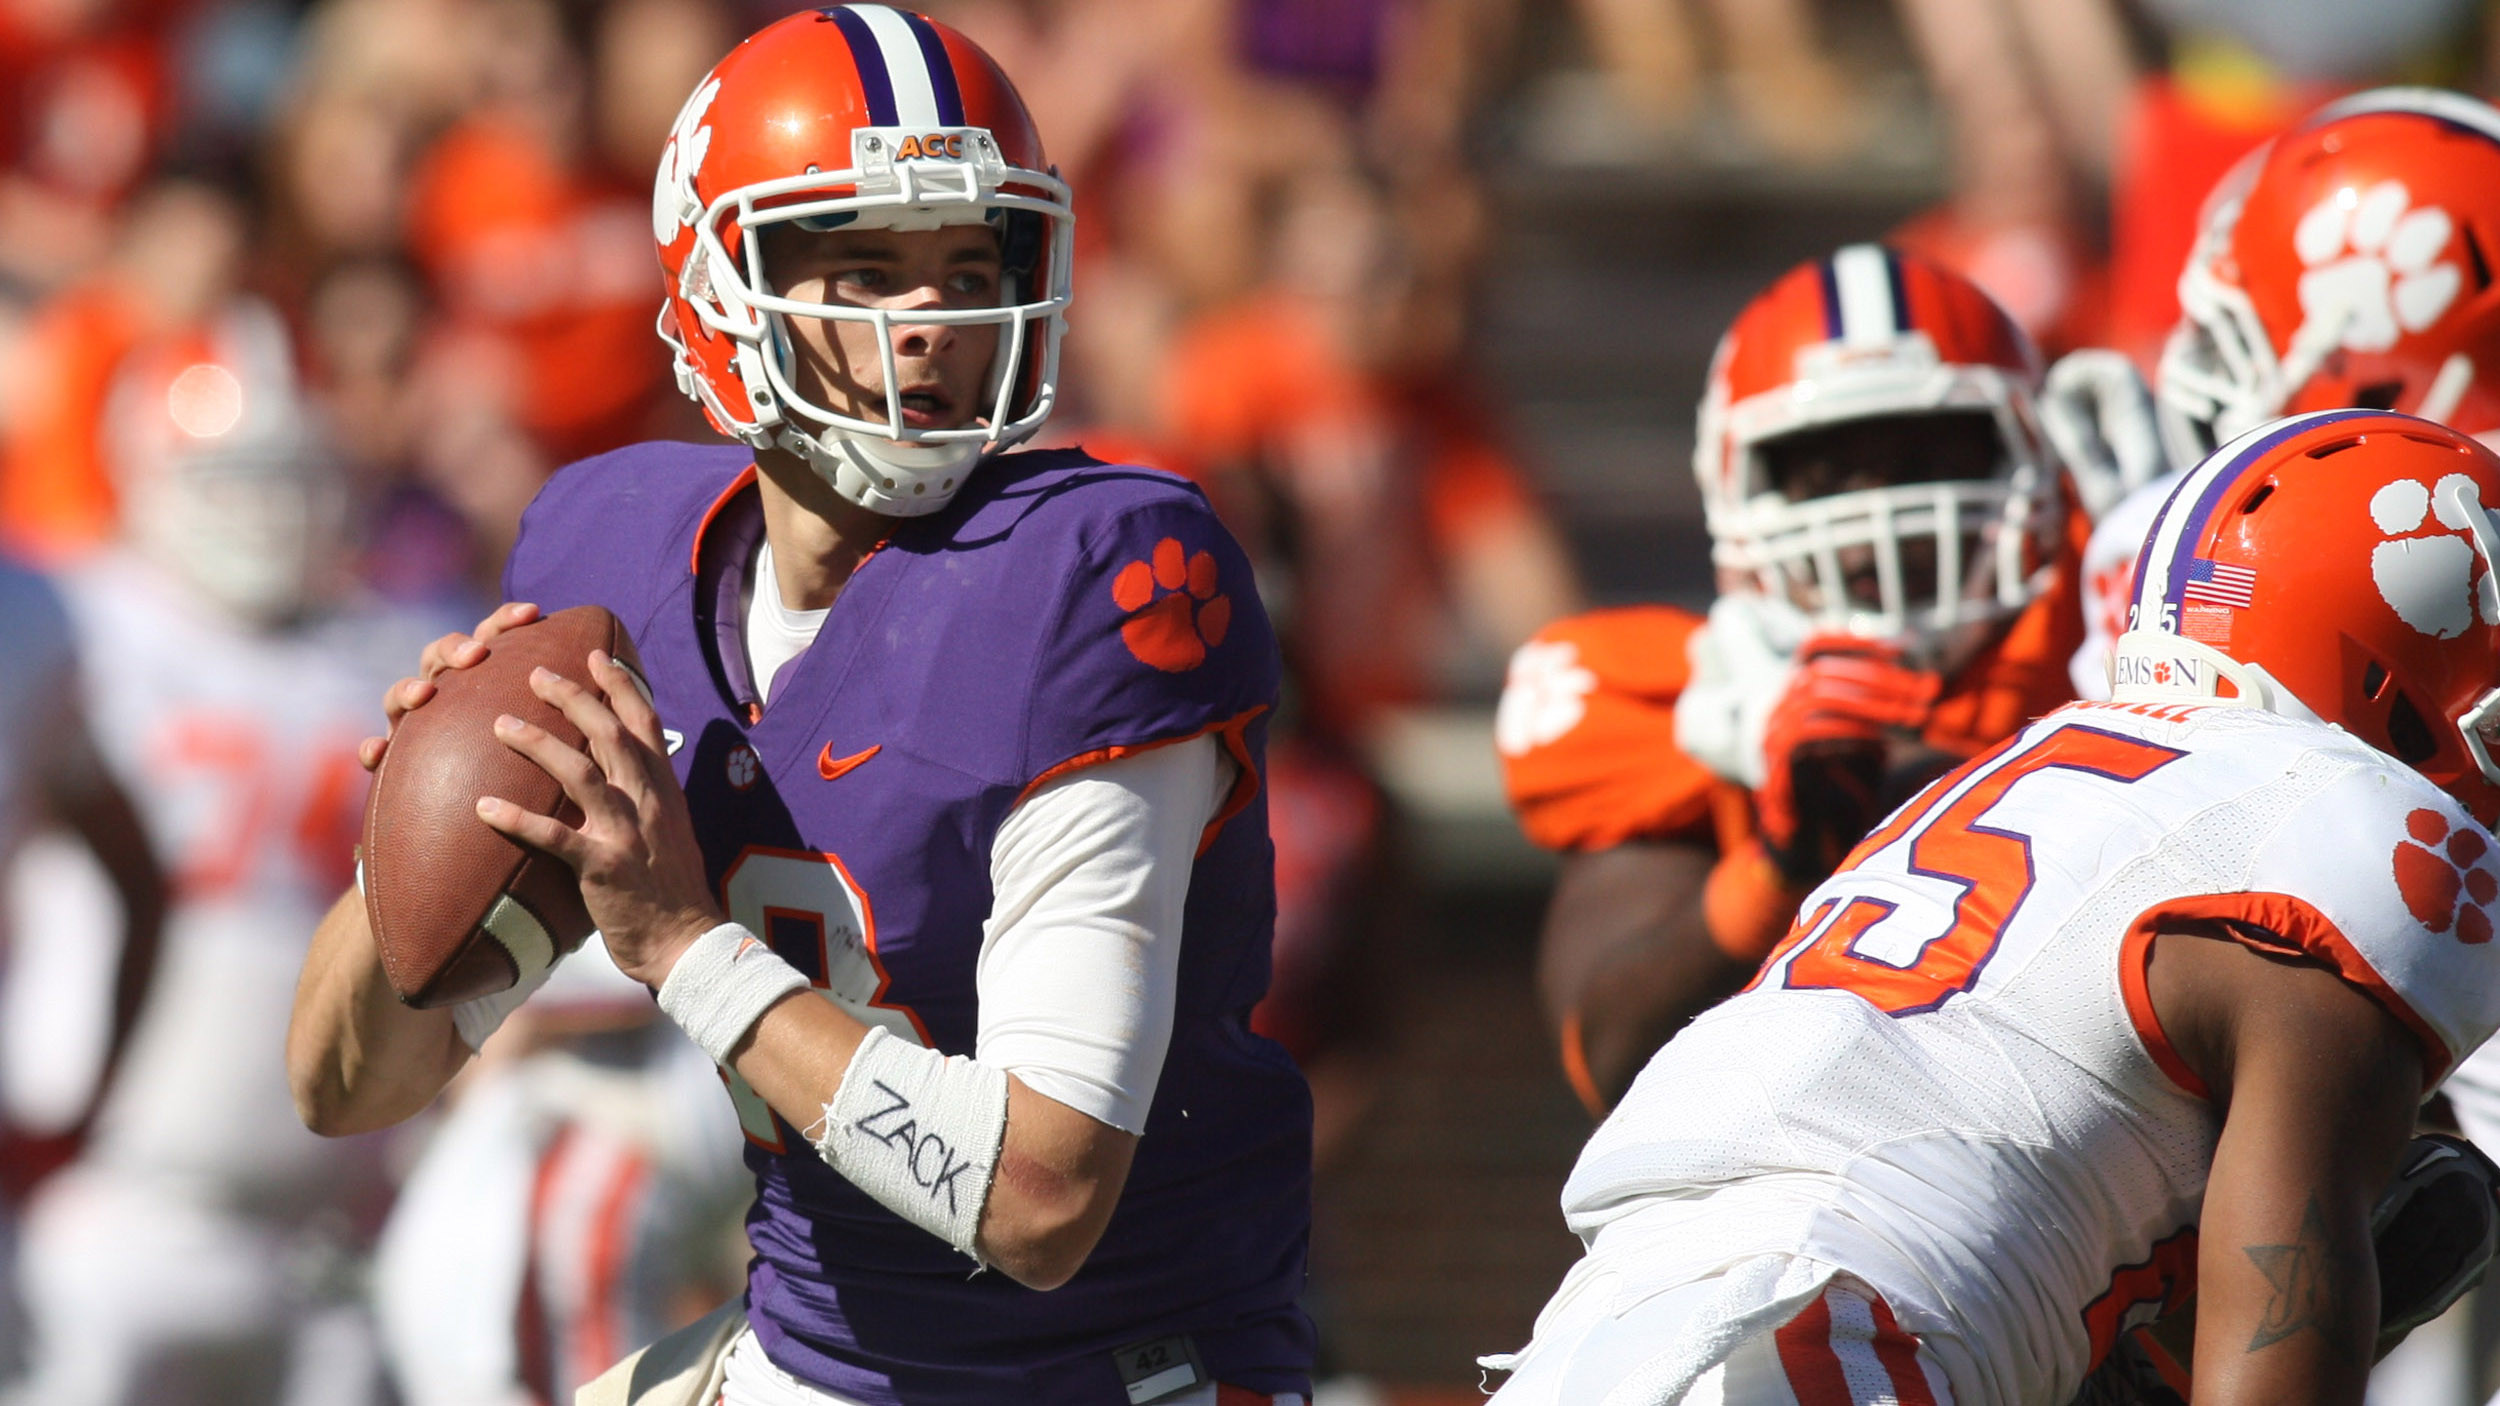 Orange Defeats White 34-26 in Clemson Spring Football Game